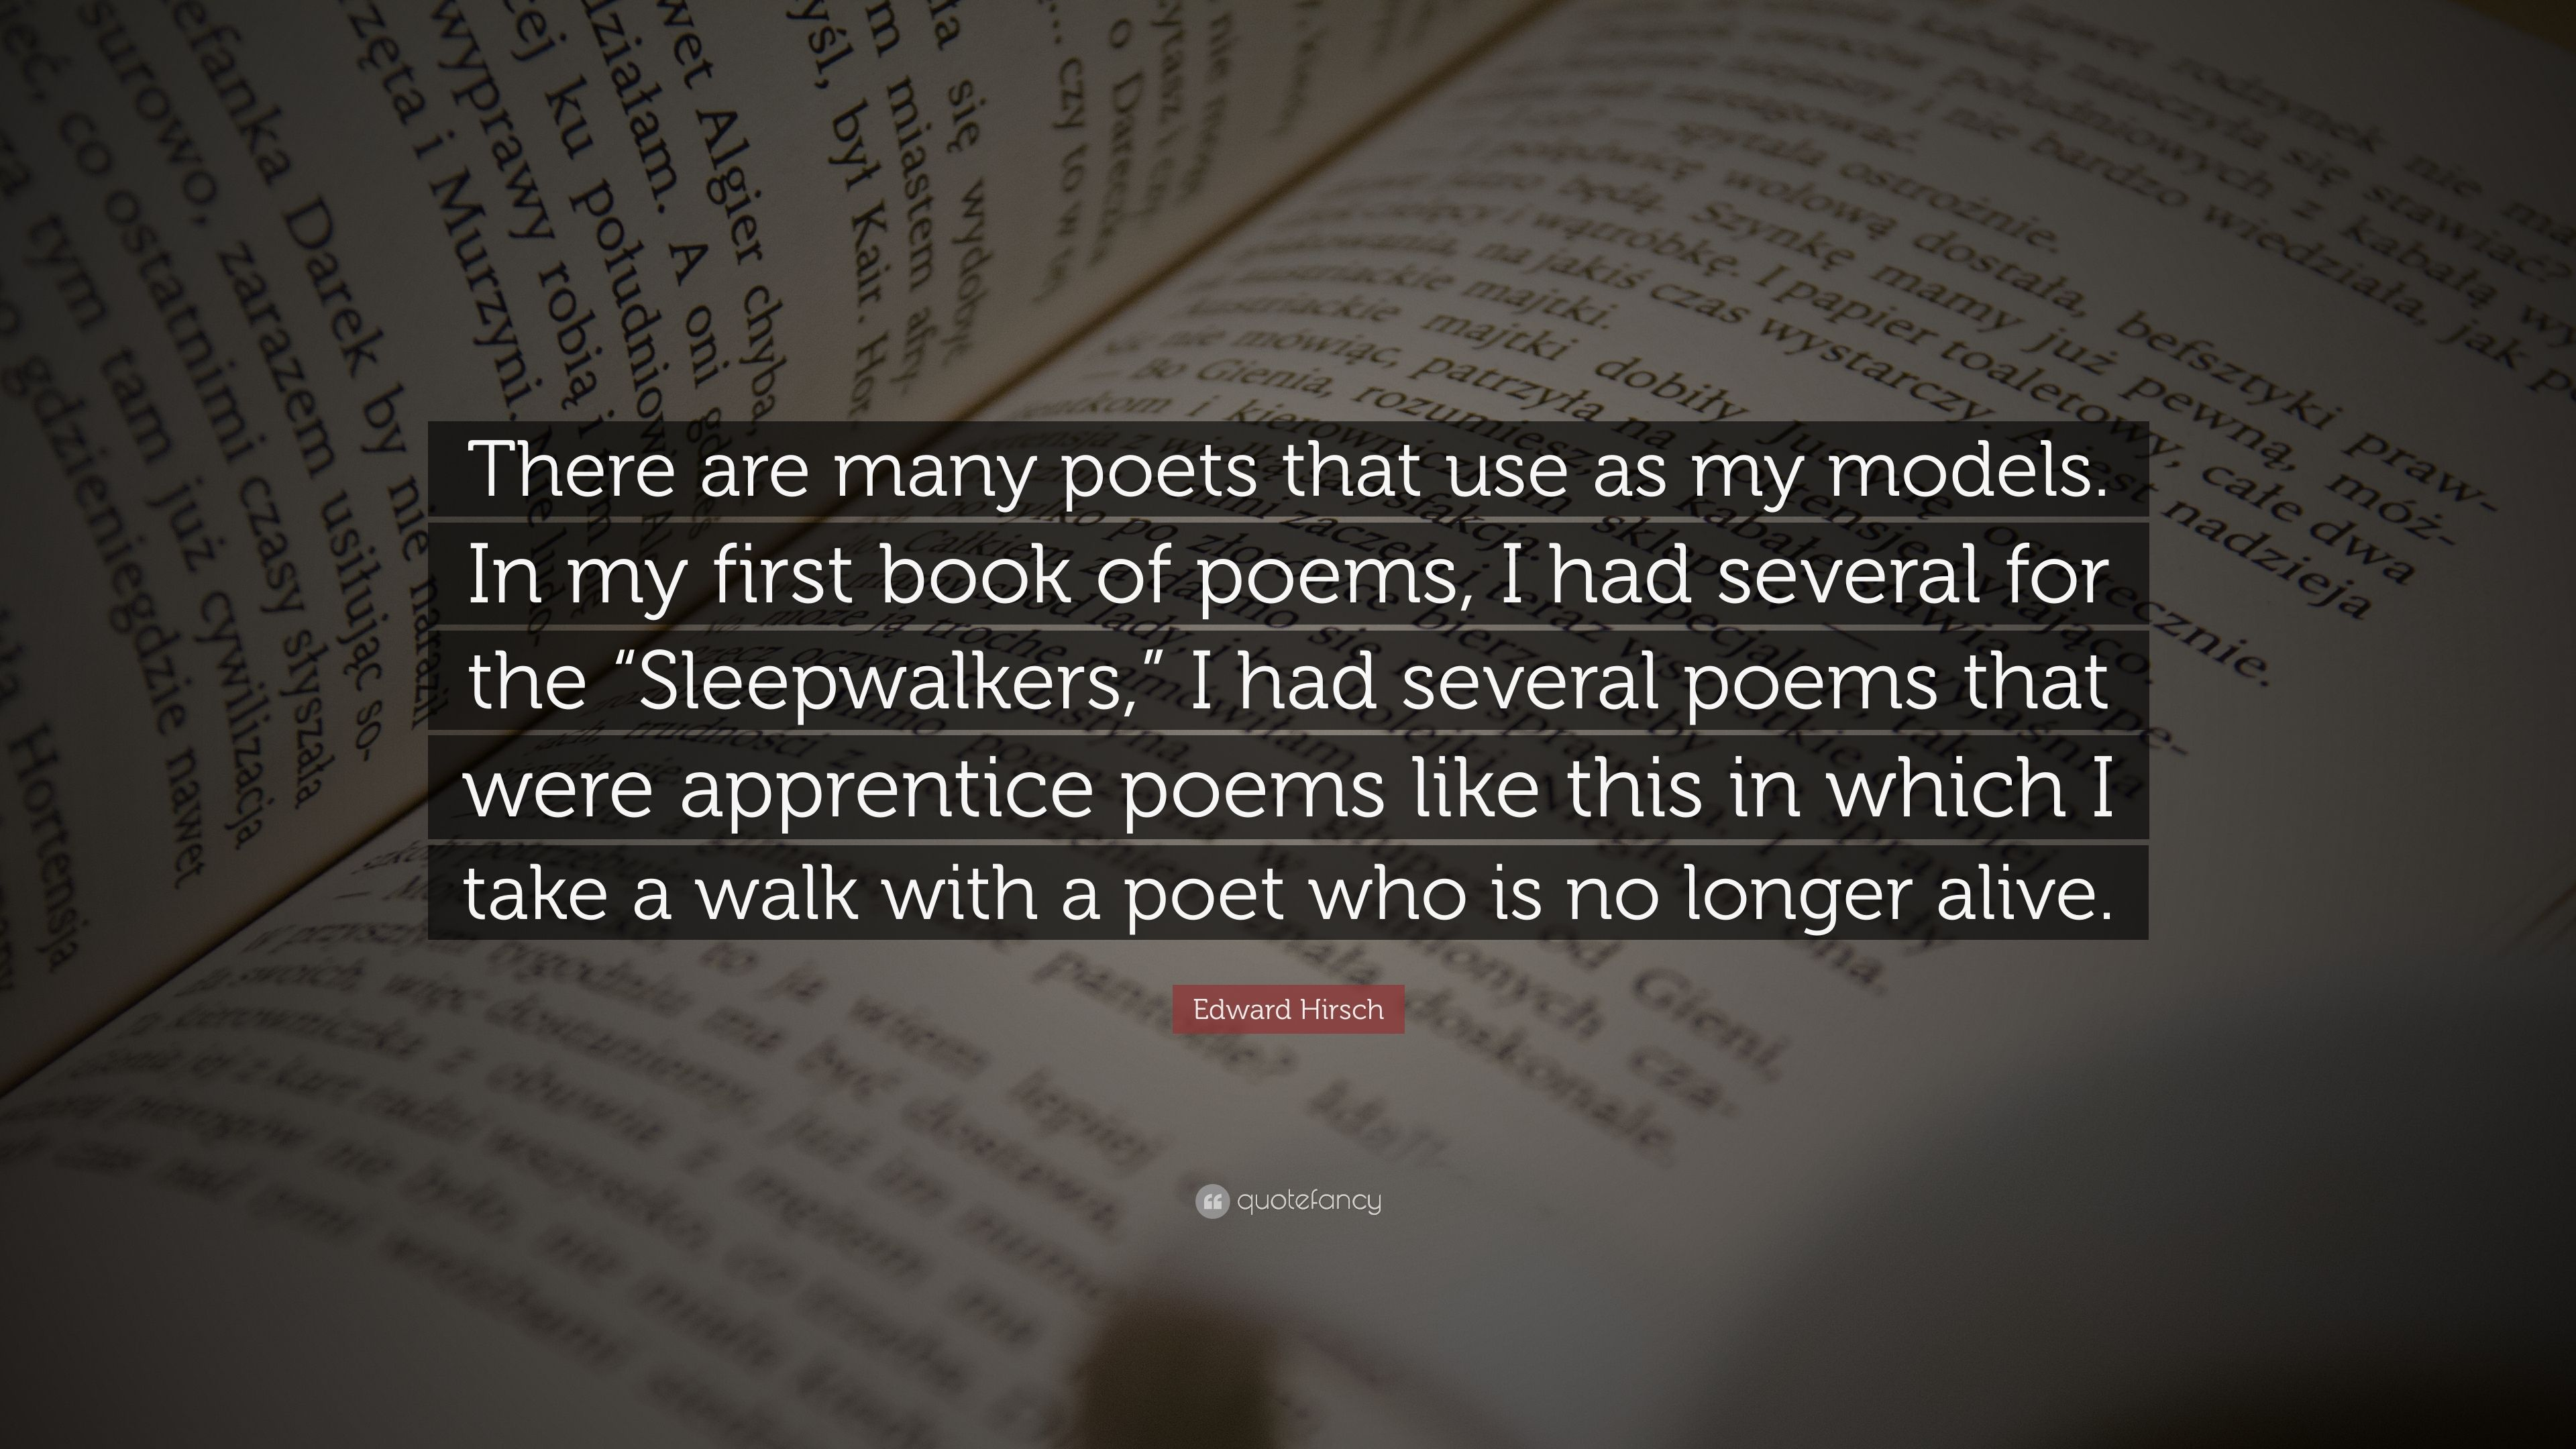 Night elie wiesel essay introduction